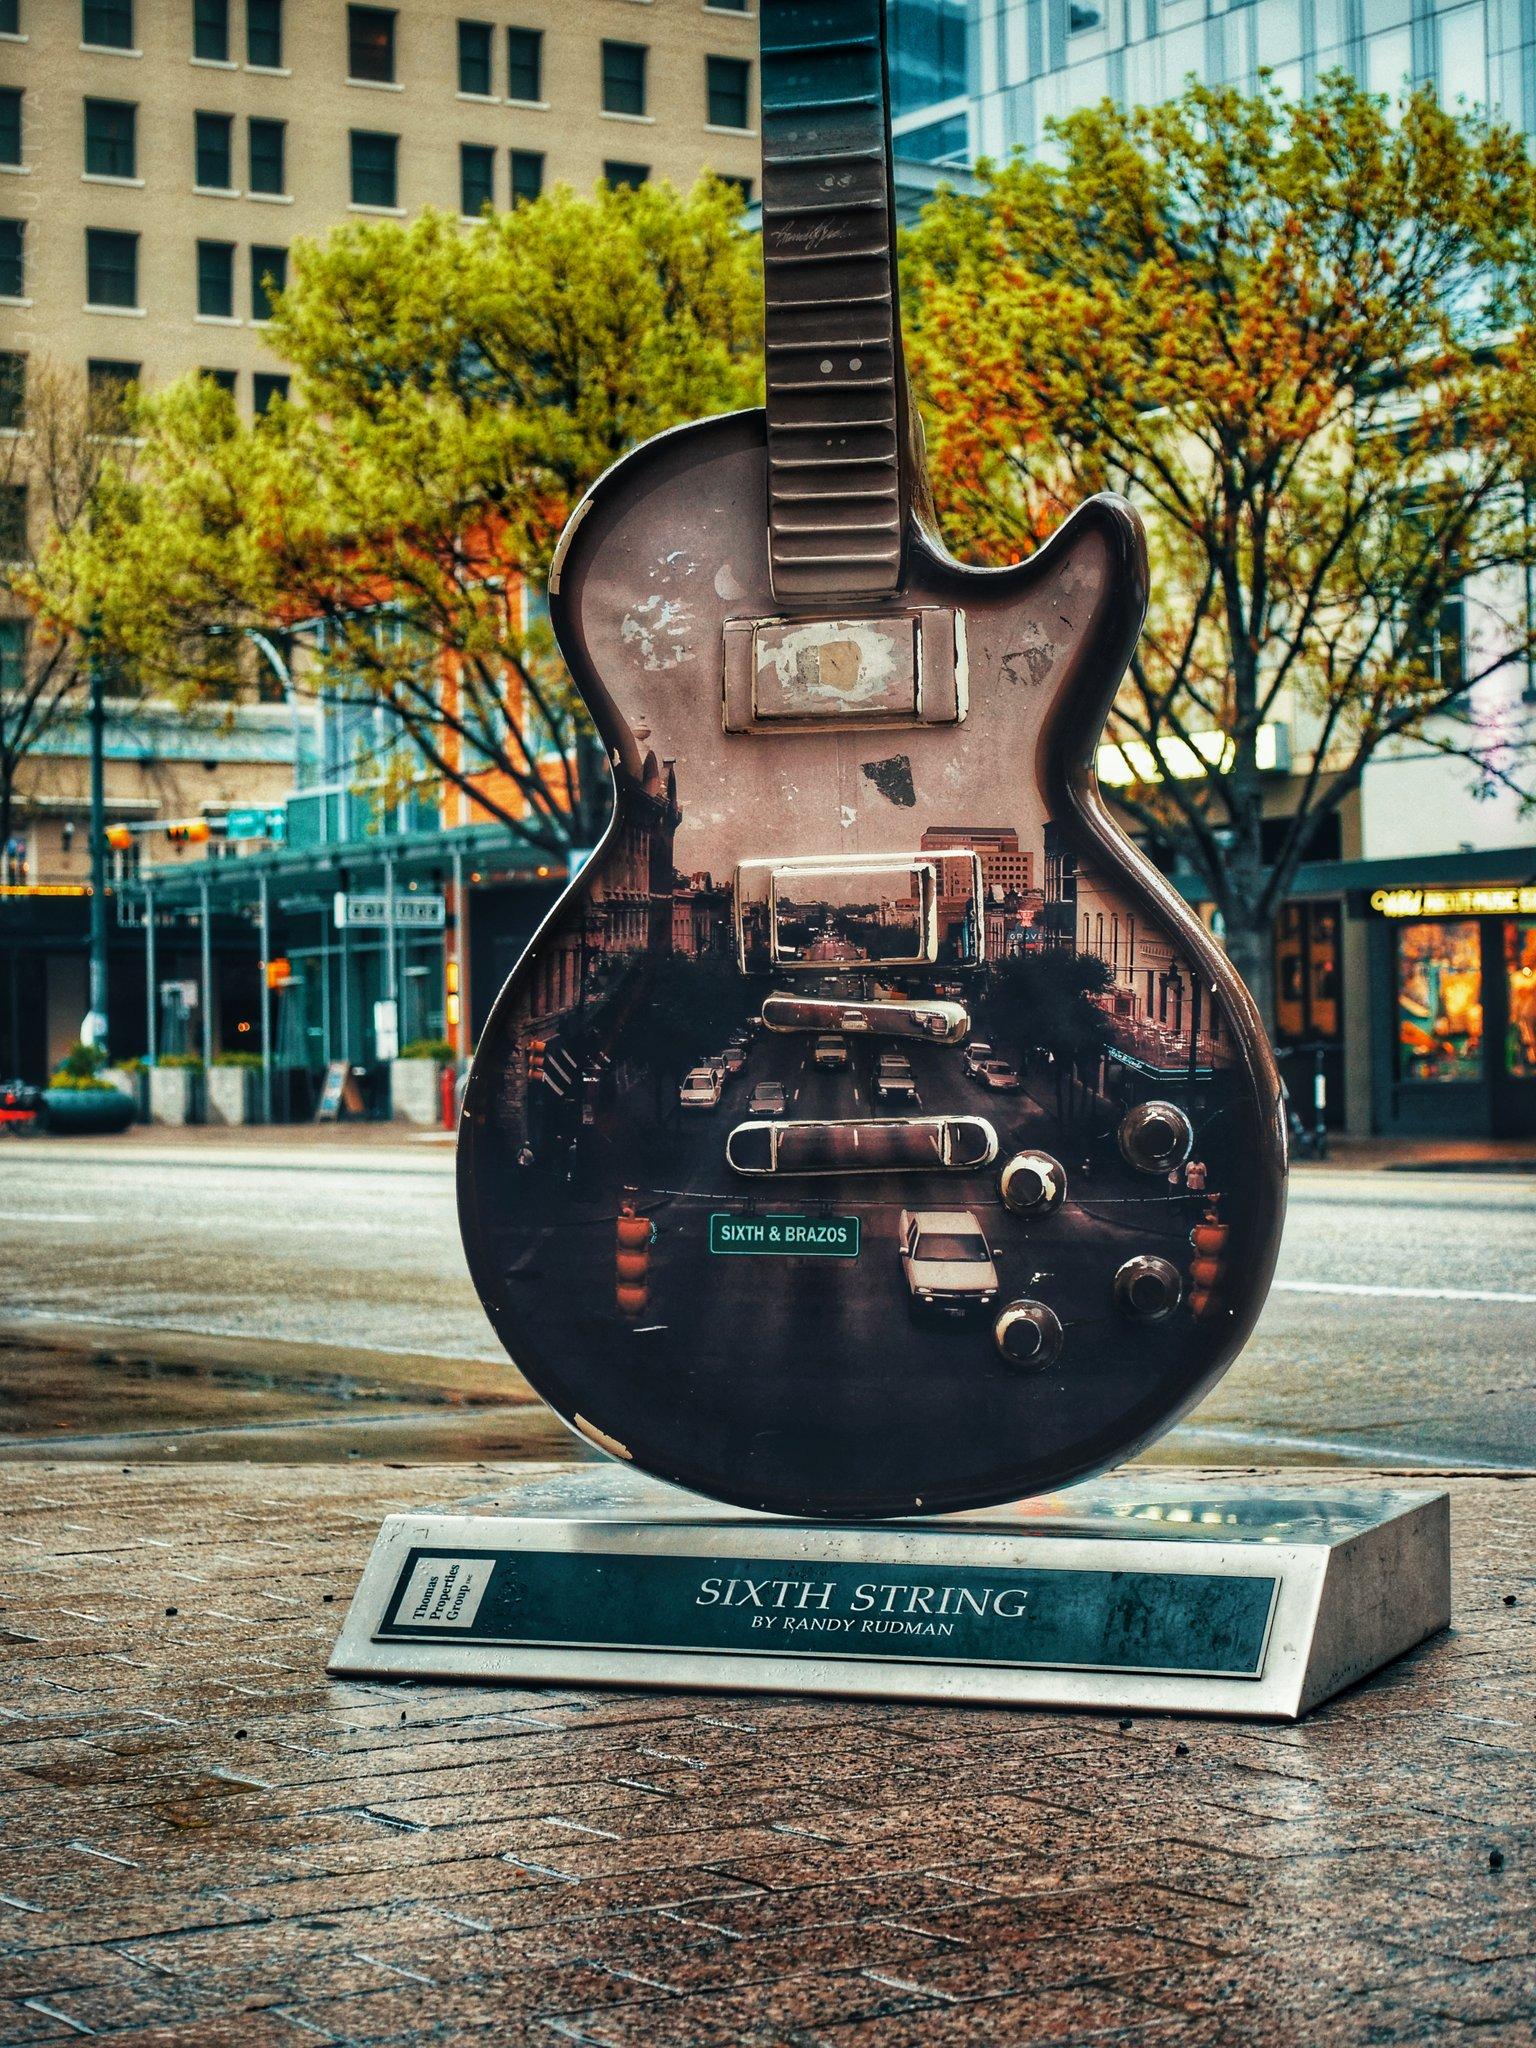 🎸Blessed to call this place home!!! #SixthString . #atx #guitar #livemusiccapitaloftheworld #austintexas #art #austinart #artinstallation #streetart #music #artofmusic #austin #randyrudman #sixthstreet https://t.co/v8SdyiSYGu